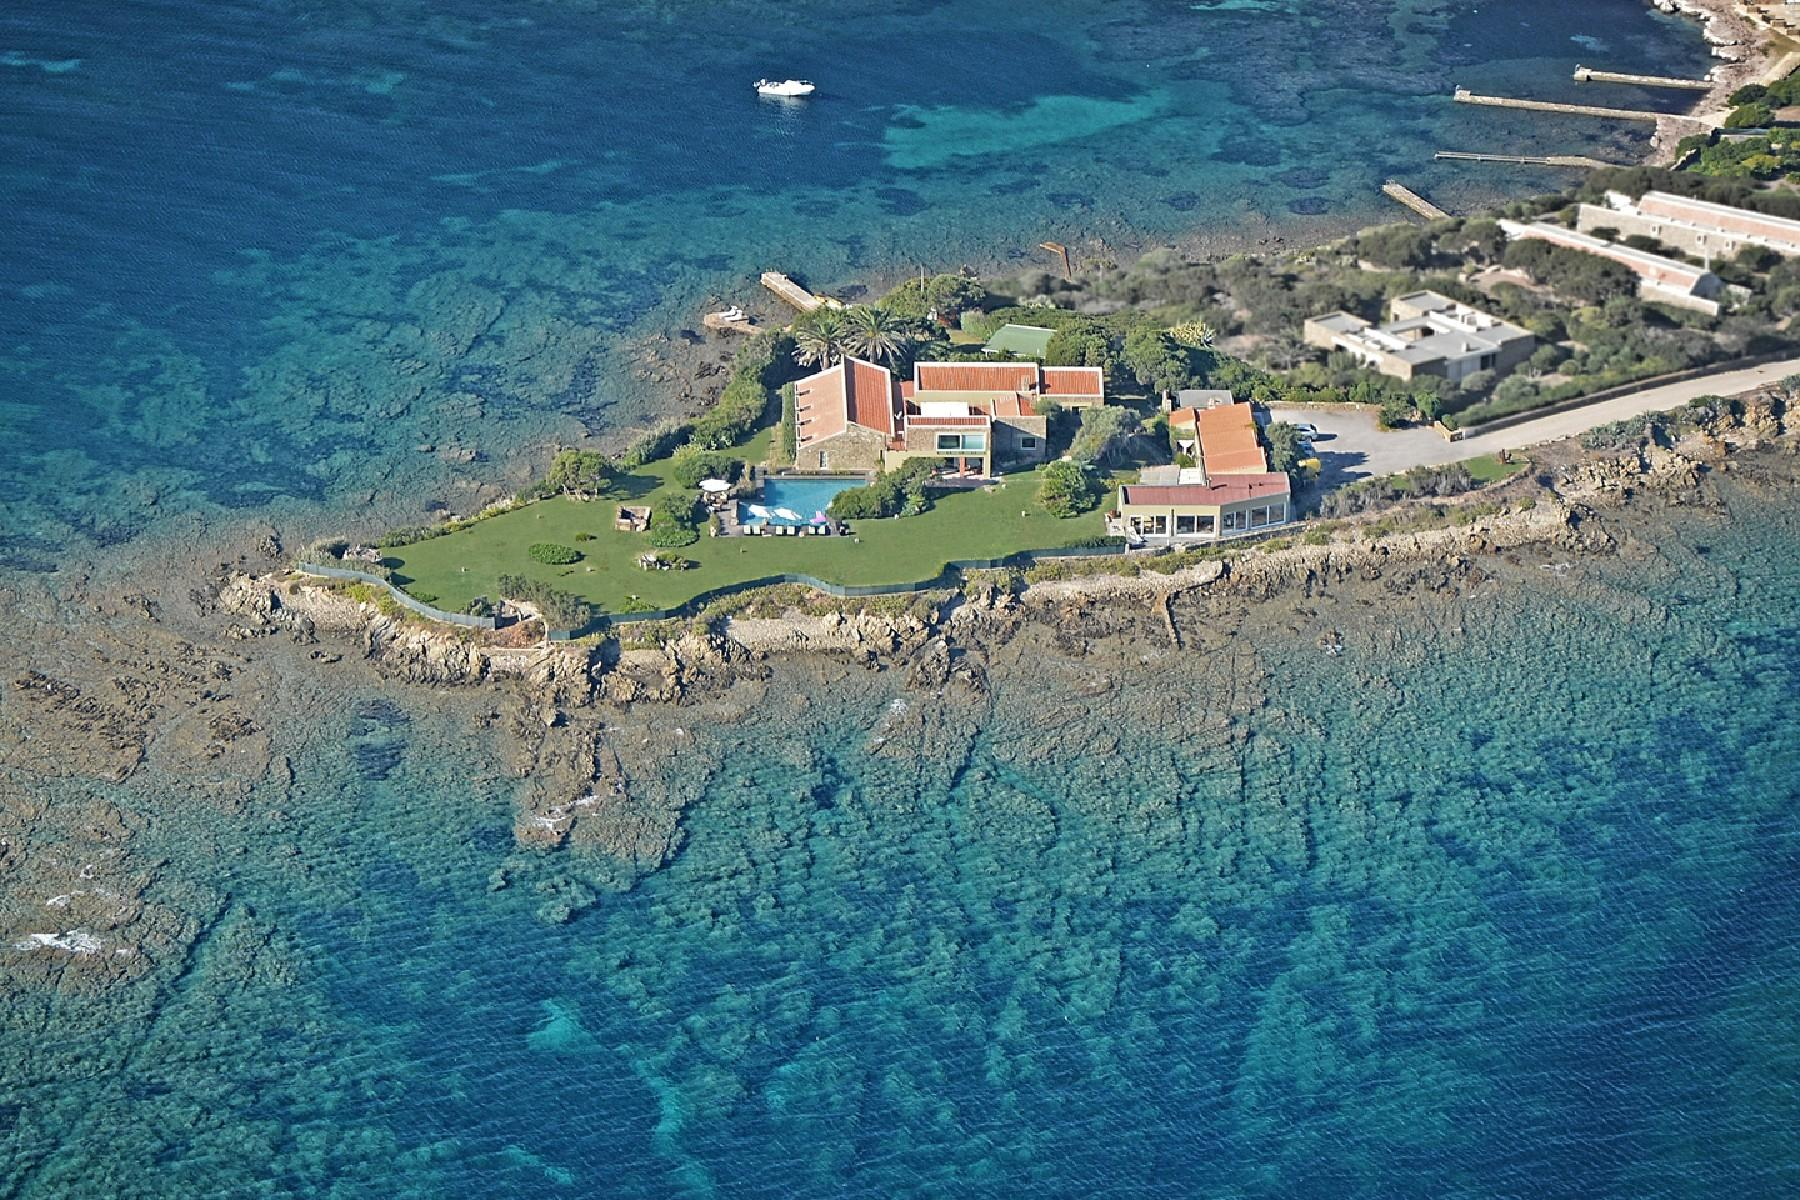 Pieds-dans-l'eau Villa auf einer privaten Halbinsel - 2